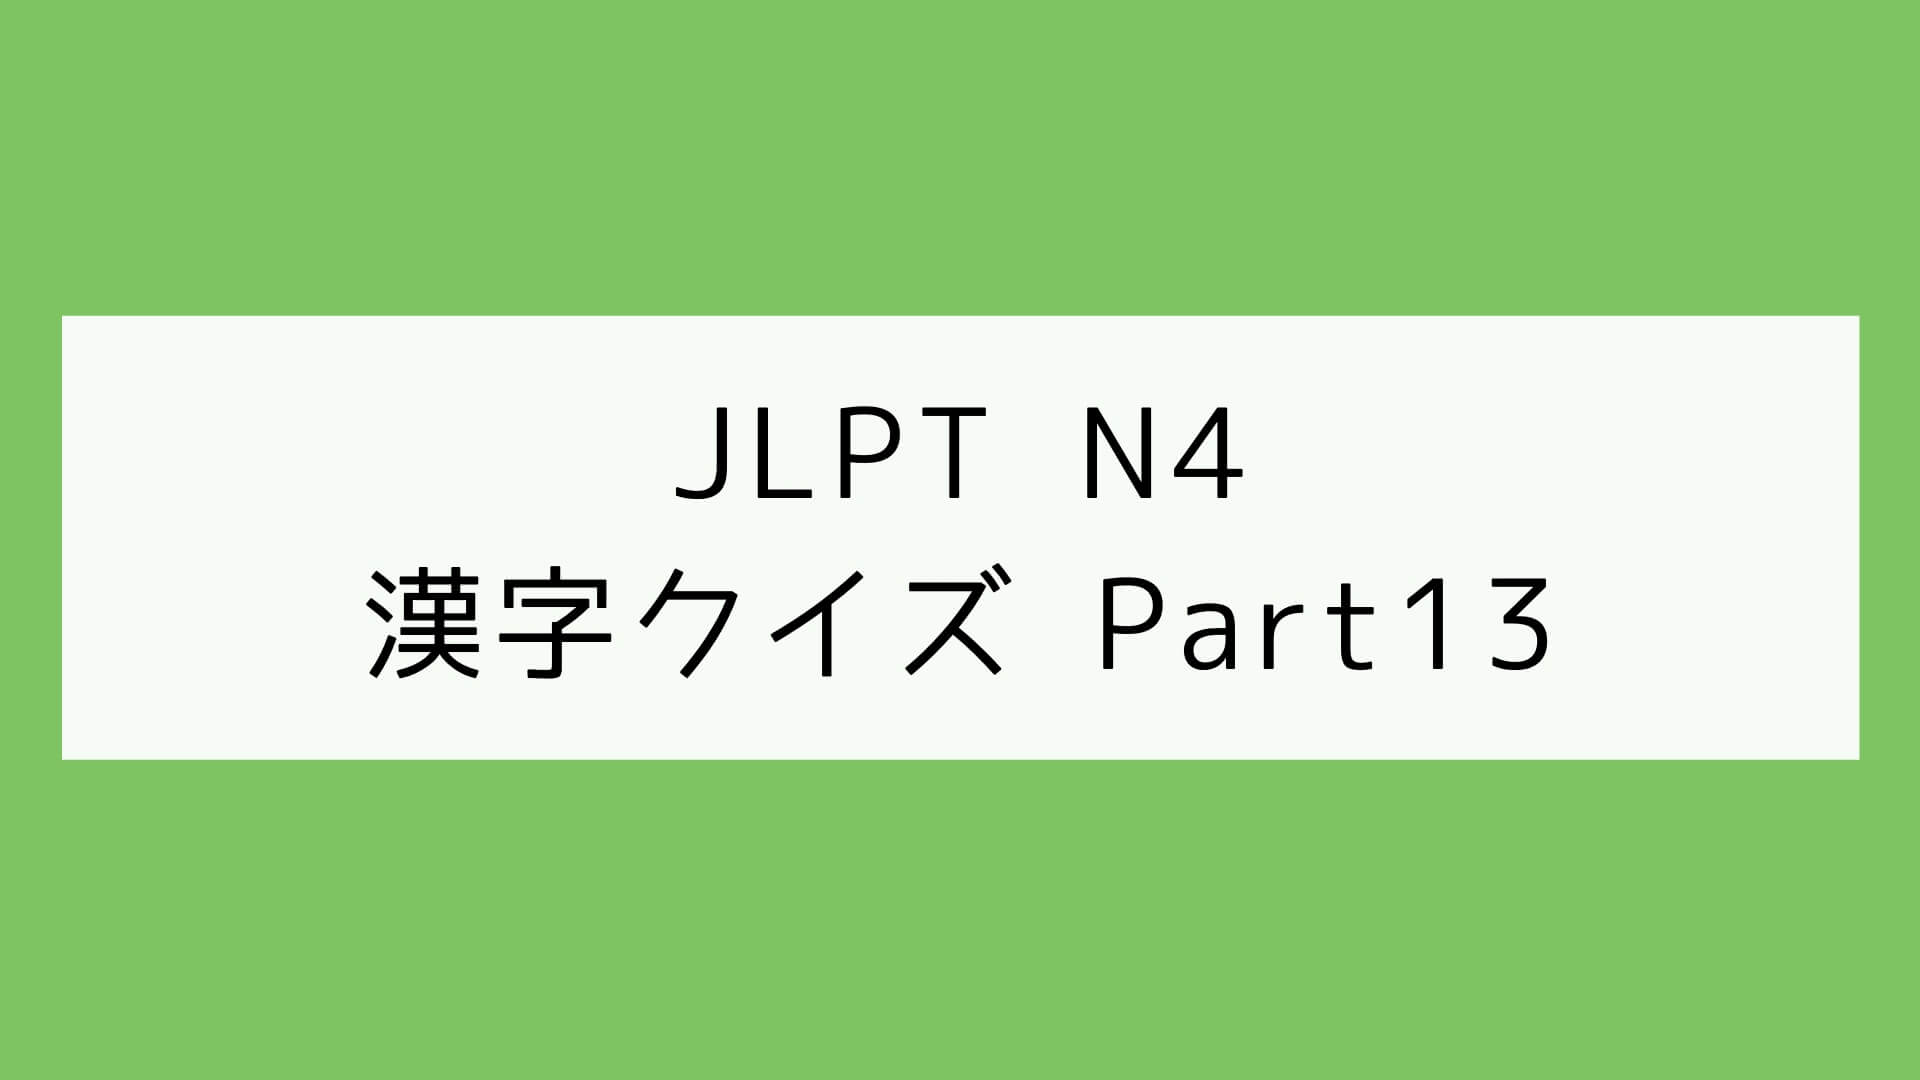 【JLPT N4】漢字クイズ Part13